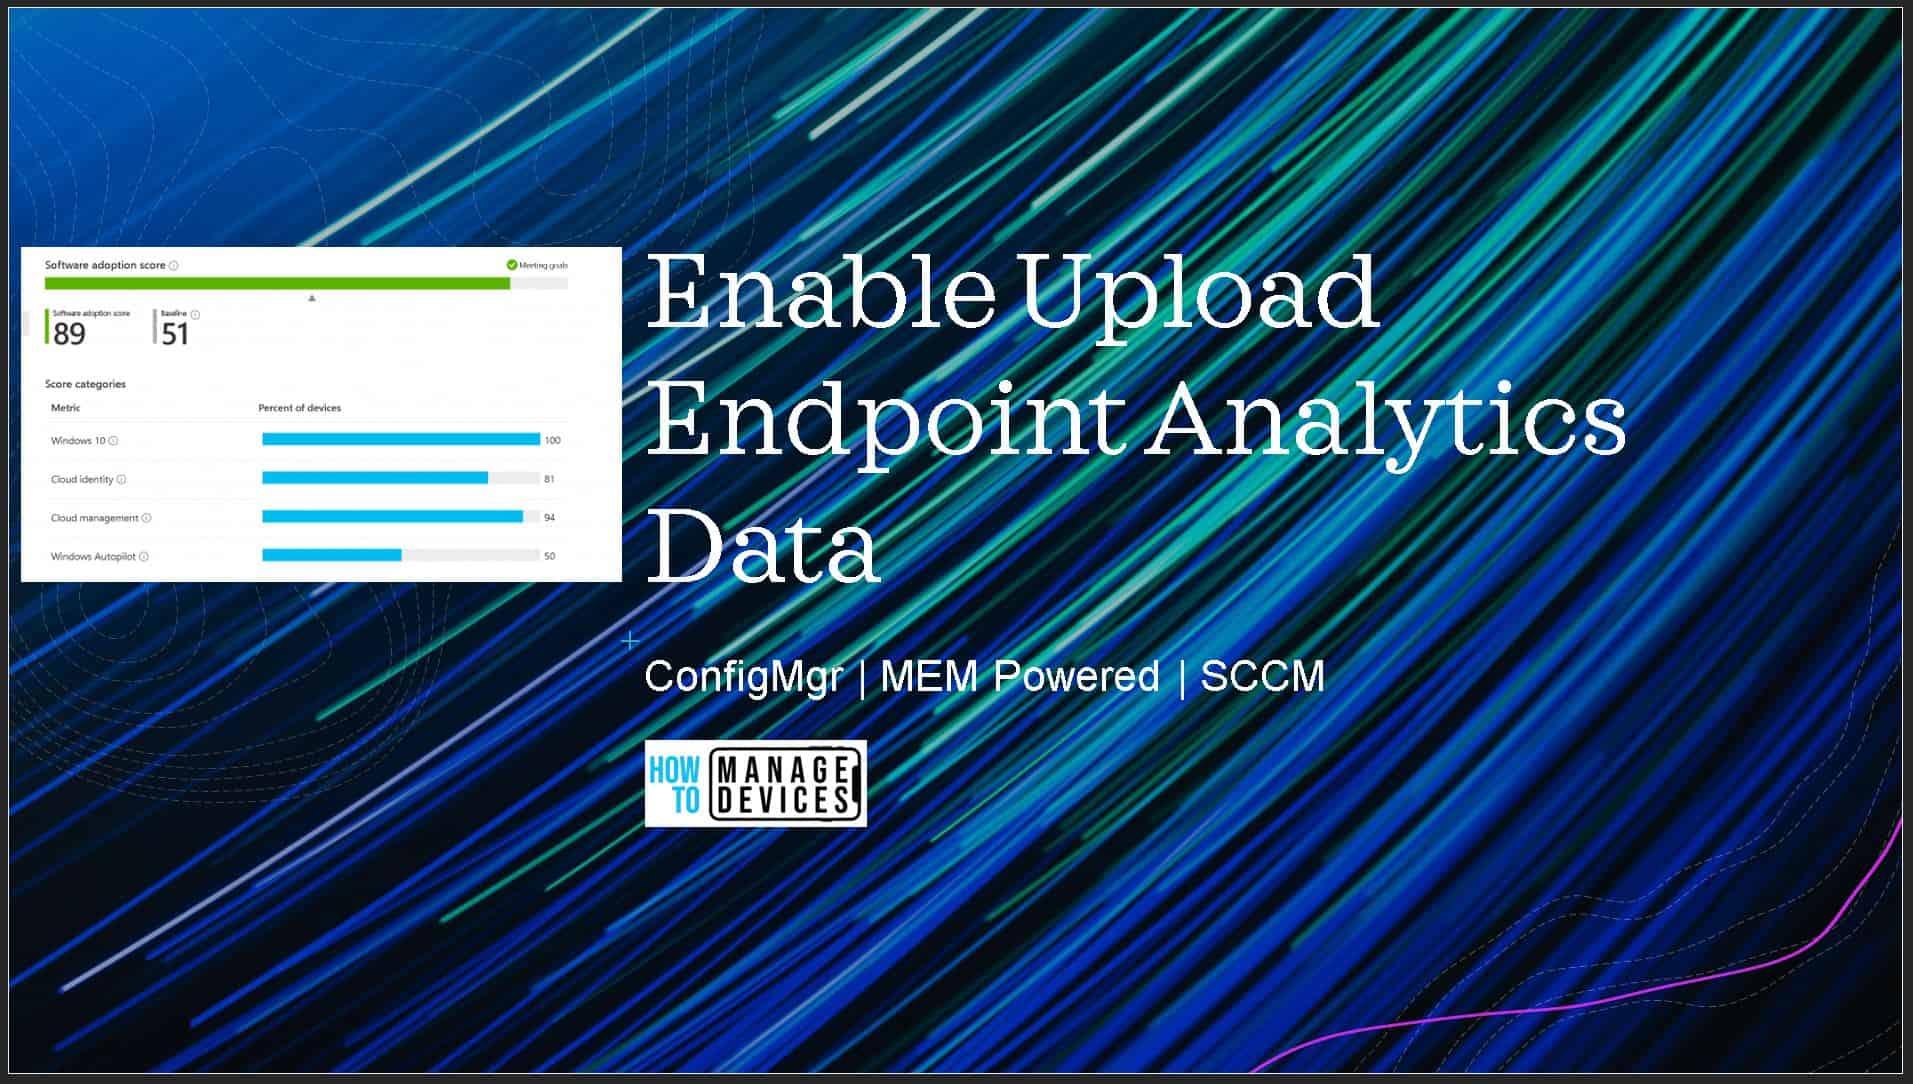 SCCM Enable Upload Endpoint Analytics Data